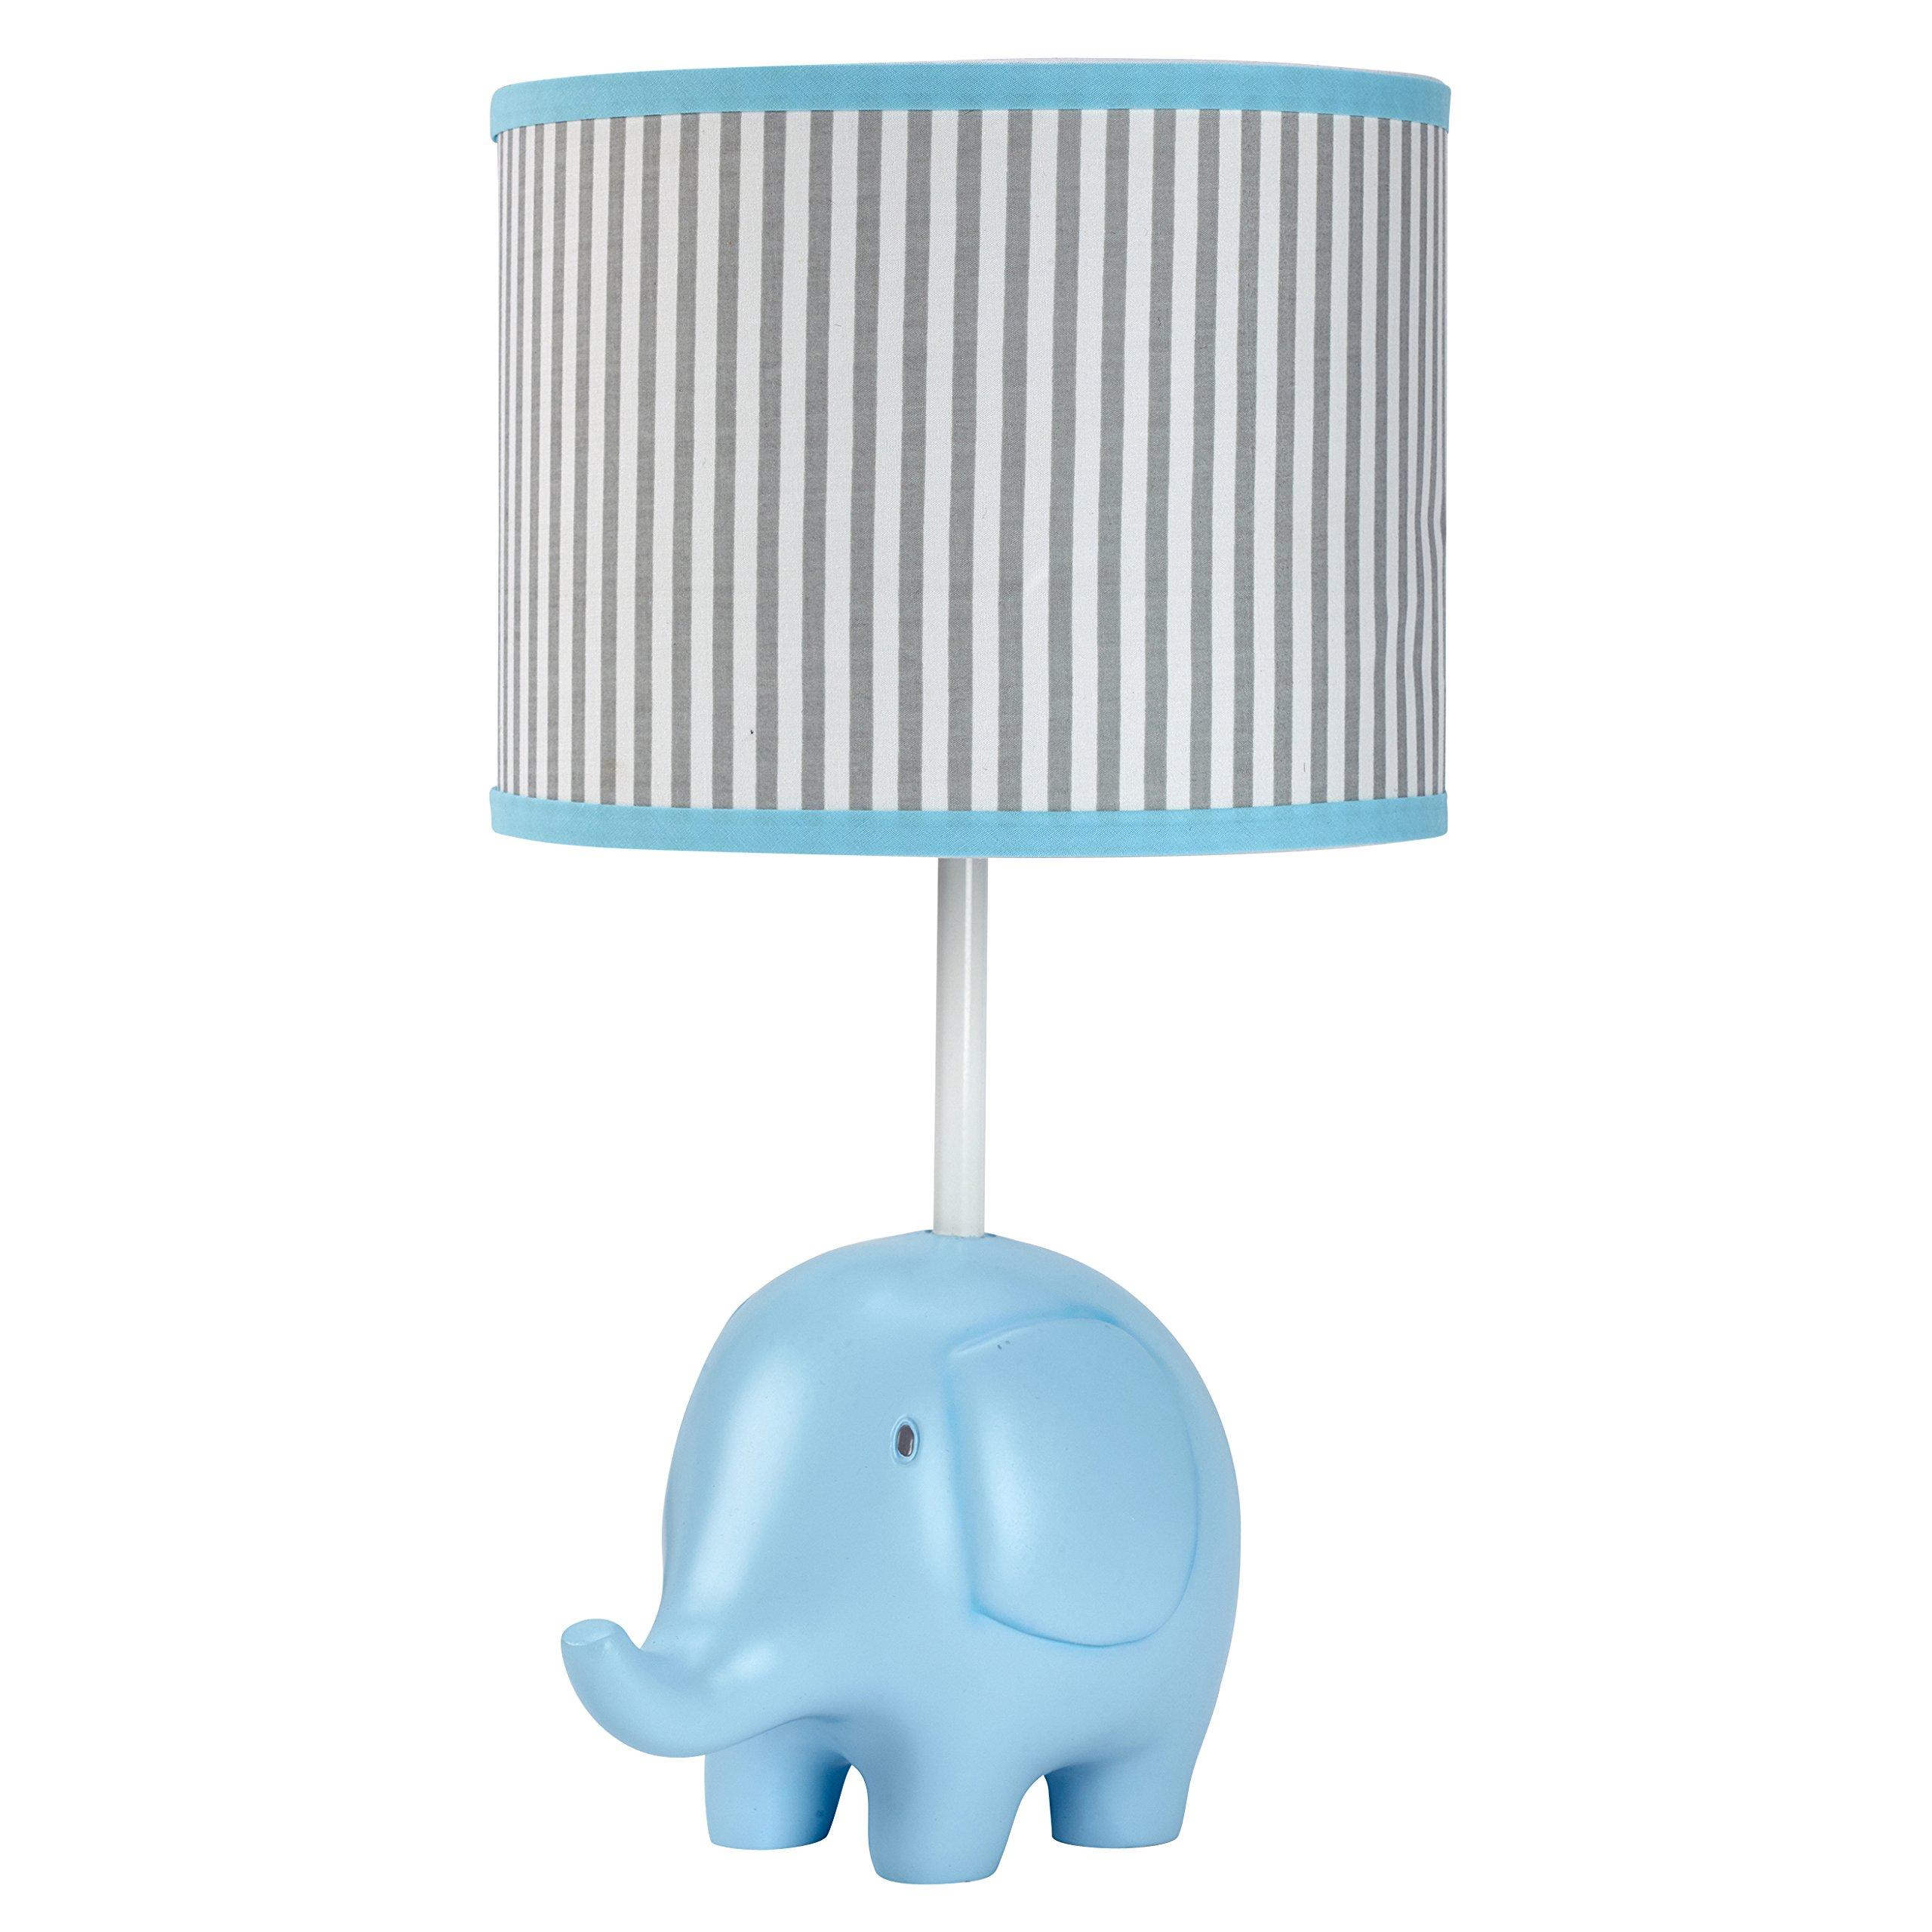 Zutano Elefant Blau Lamp and Shade, White/Blue/Grey